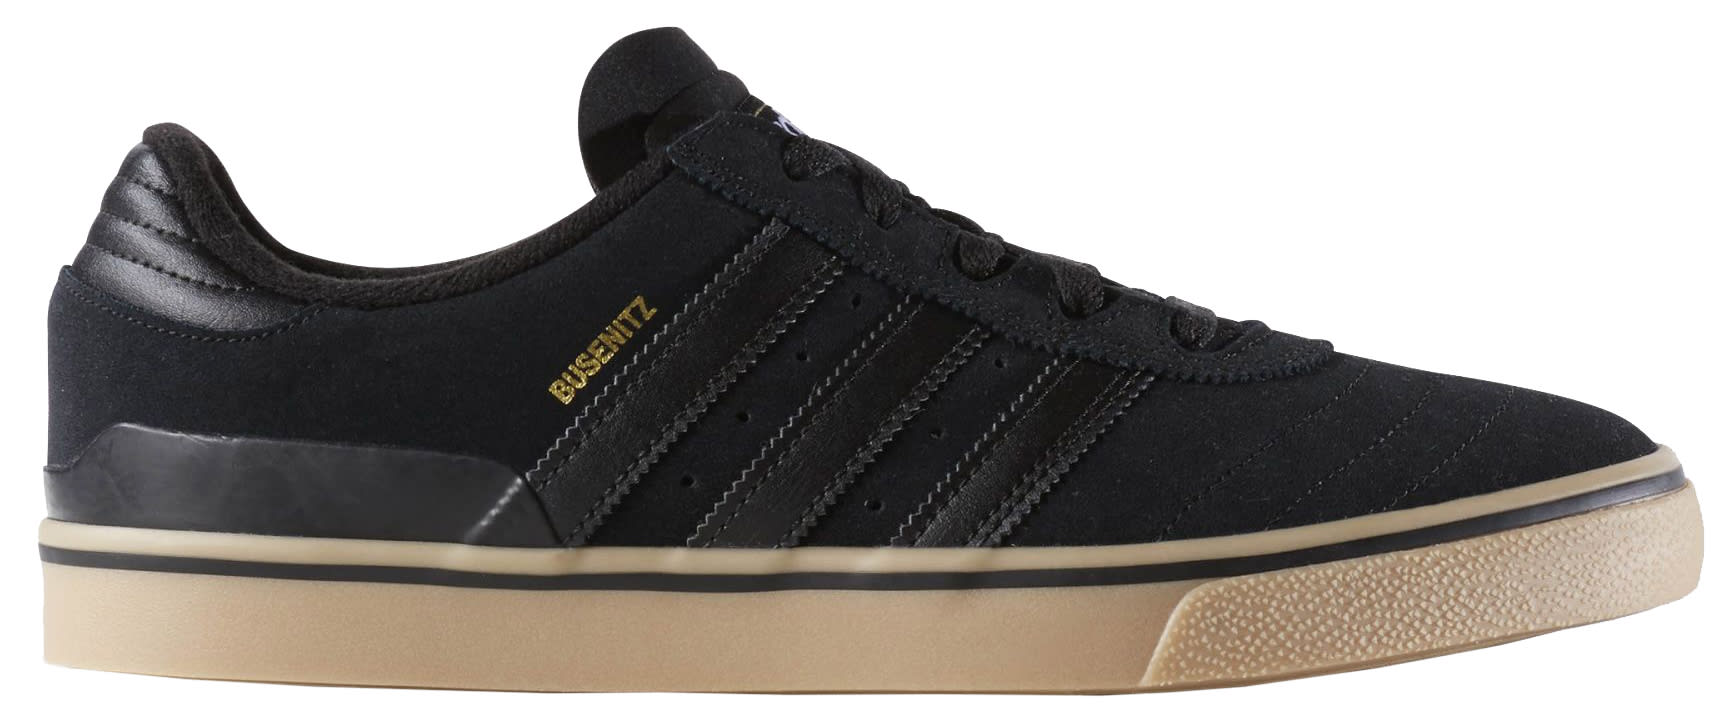 best website 1a16b 13f51 Adidas Busenitz Vulc ADV Skate Shoes - thumbnail 1